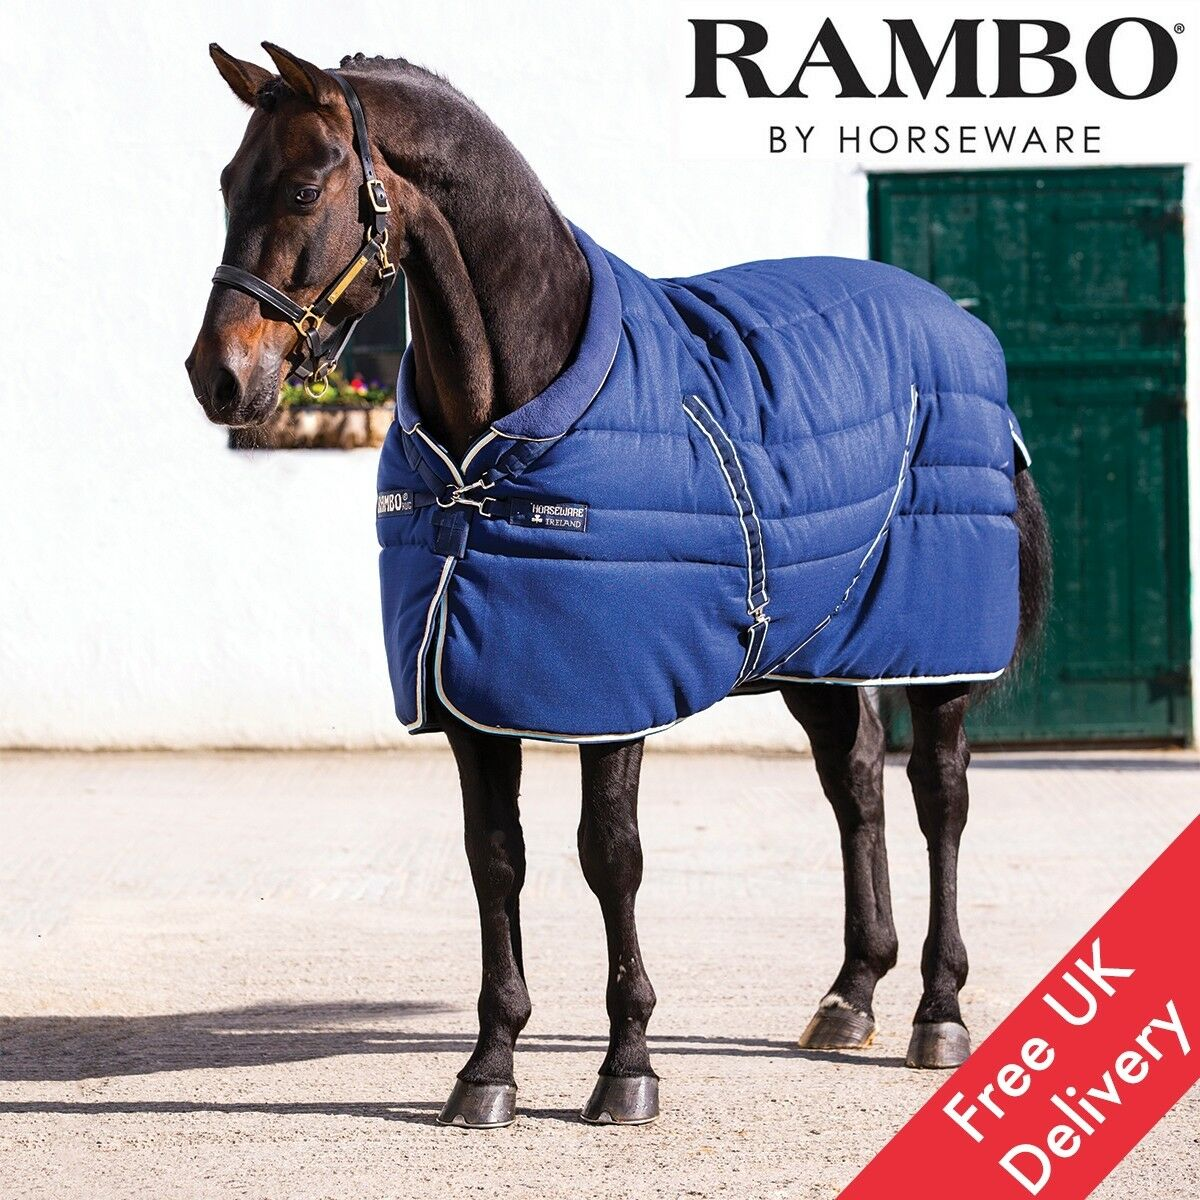 Horseware Rambo Cosy Stable Rug - Navy Beige Blau Navy